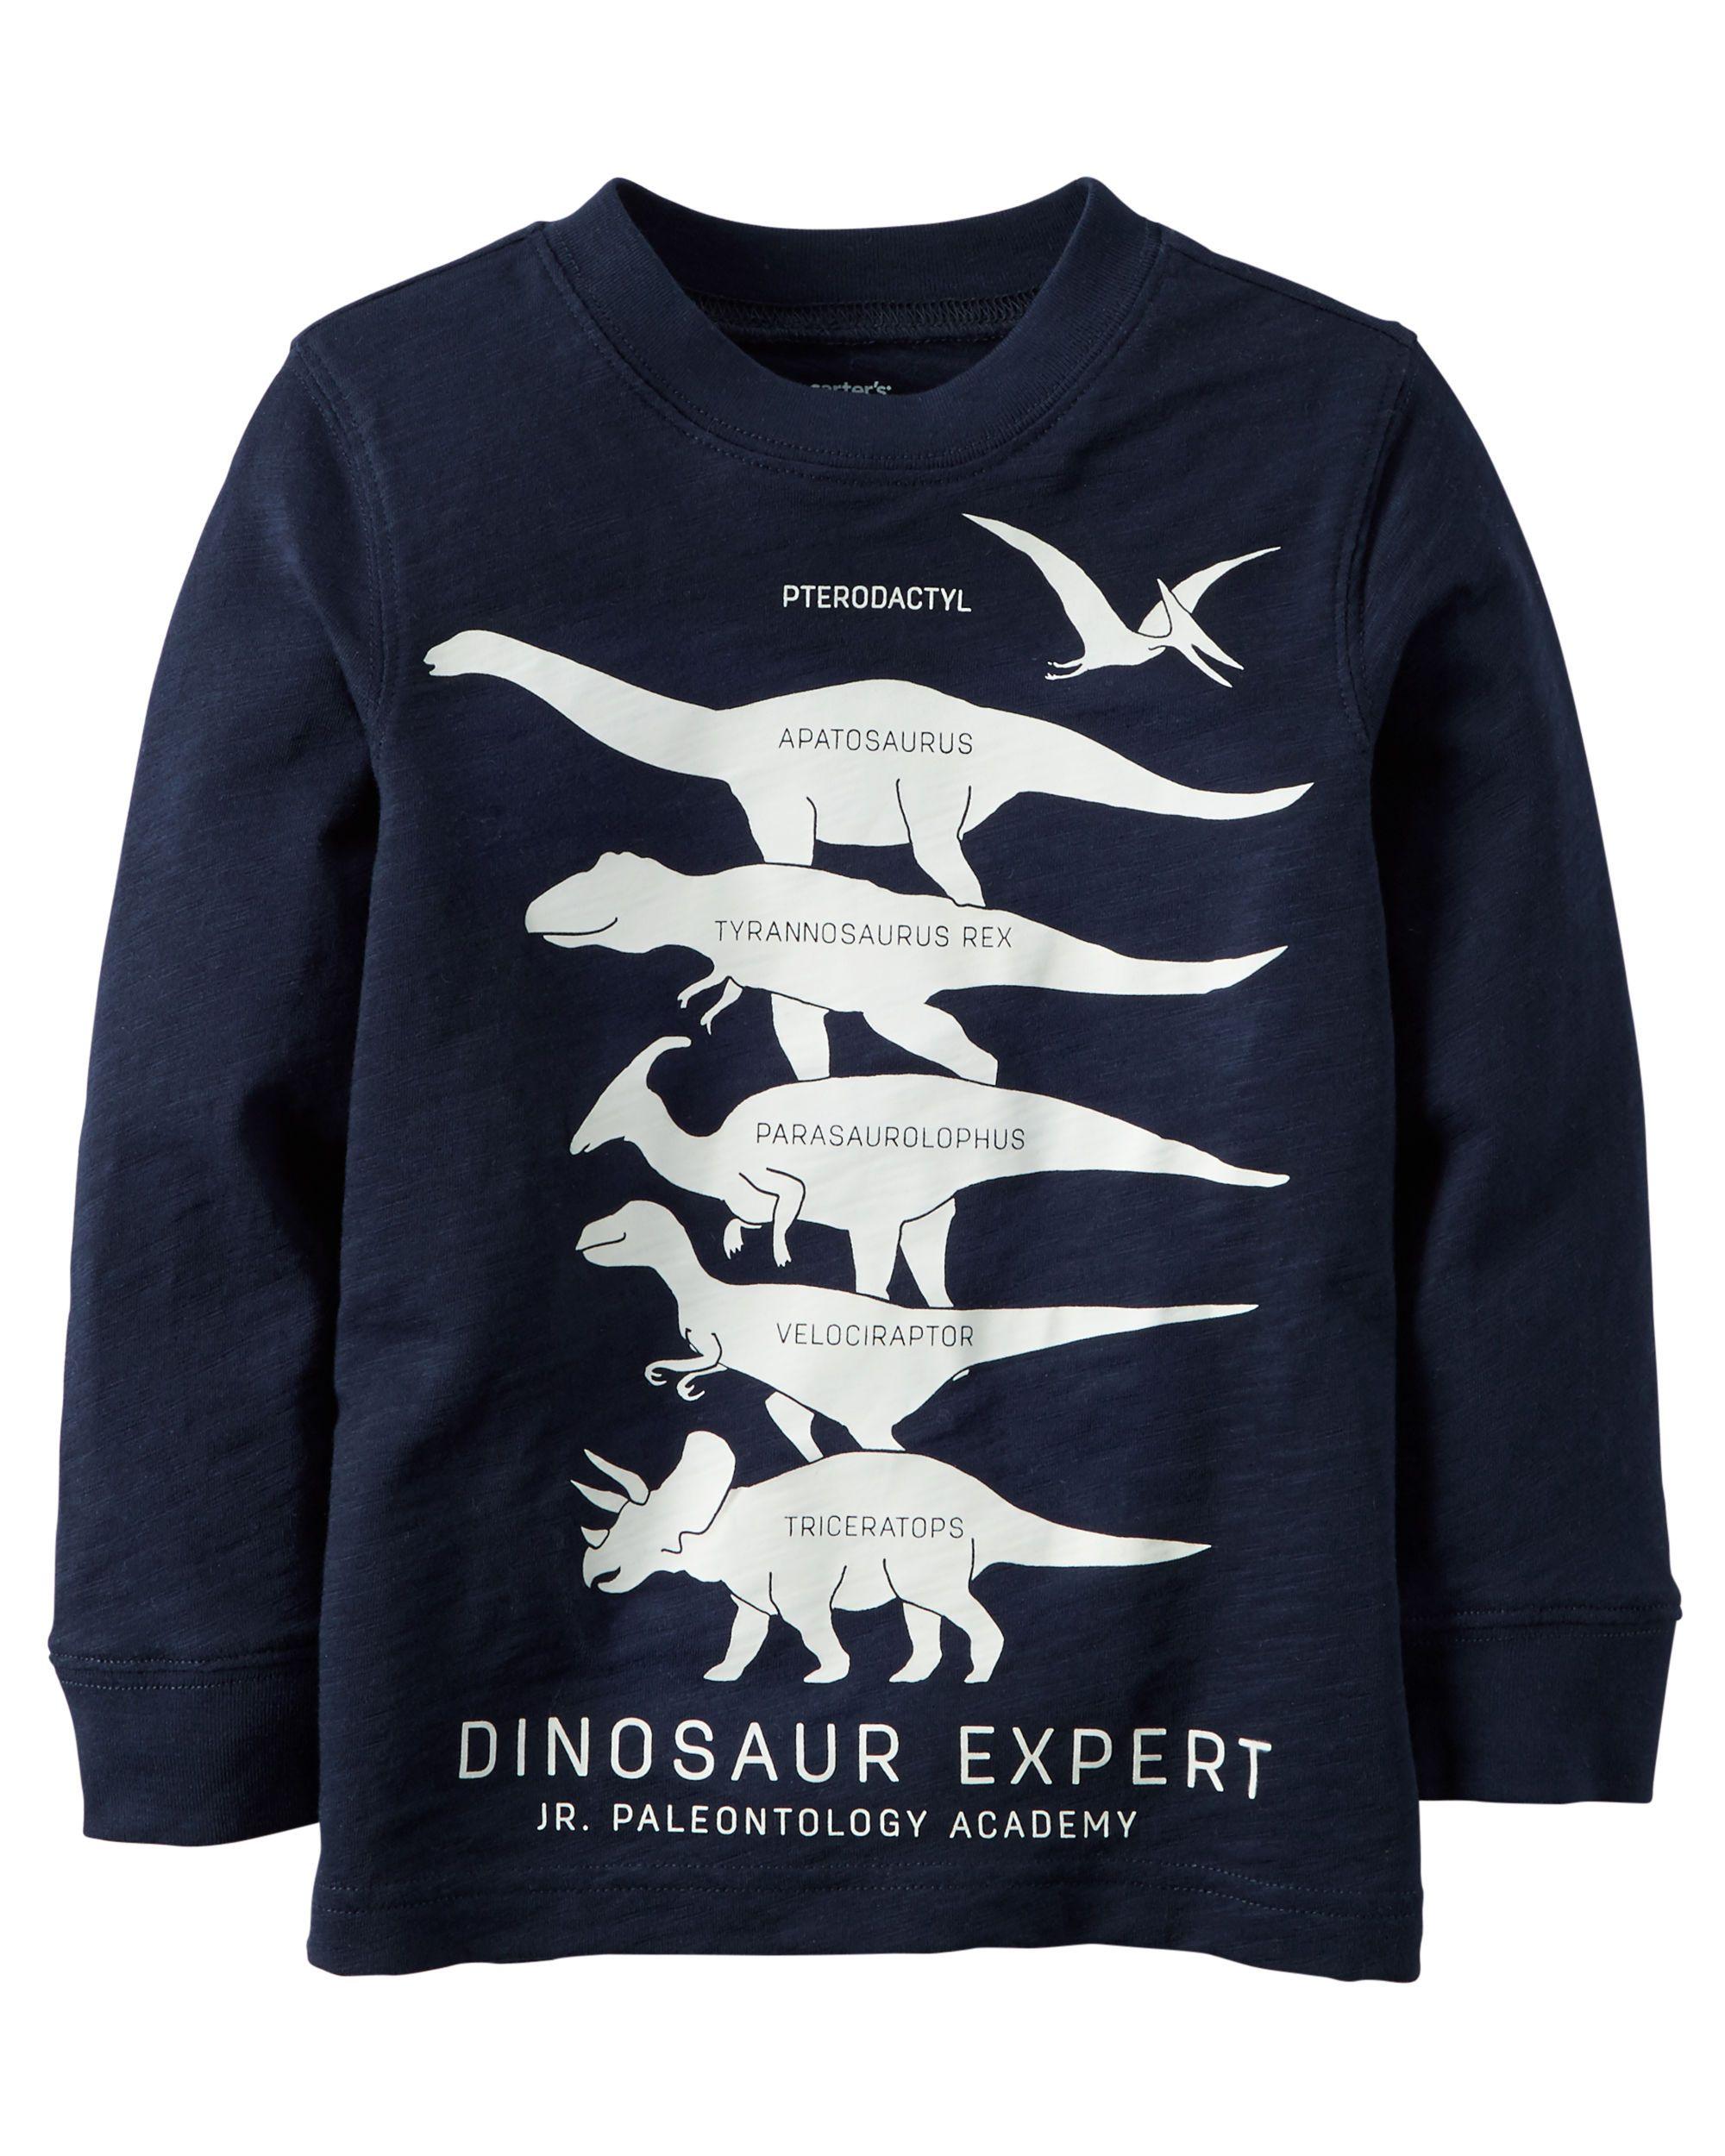 Anbaby Boys Kids Long Sleeve Dinosaur T-Shirts Sweatshirts